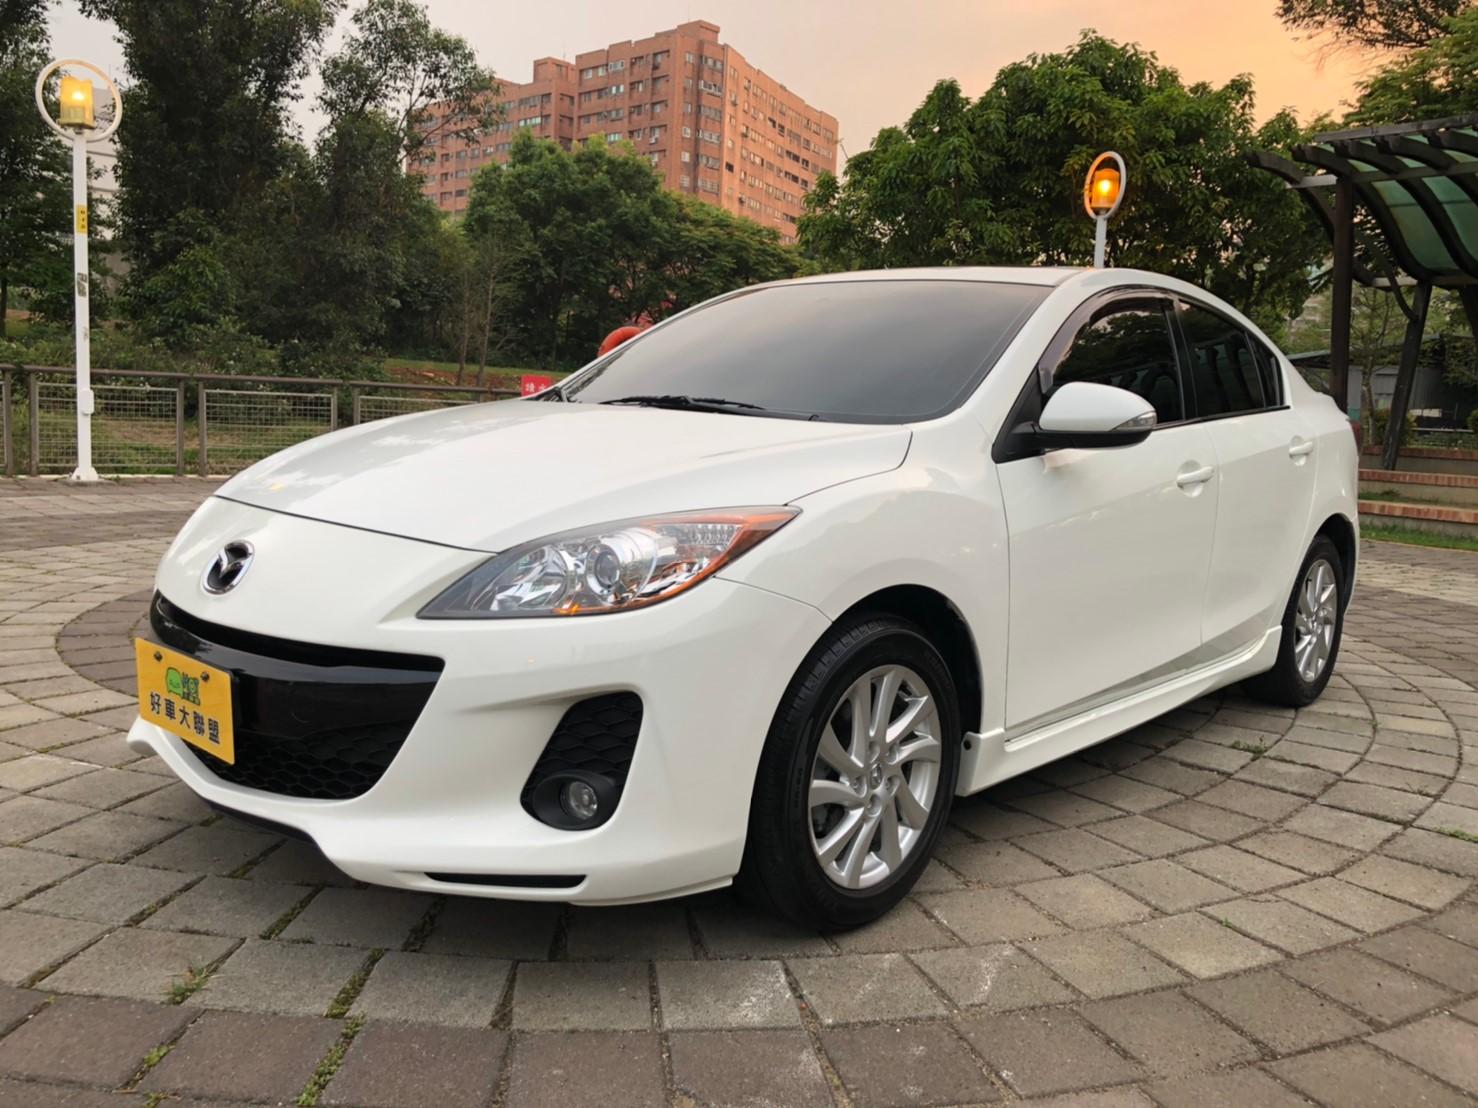 2014 Mazda 馬自達 3